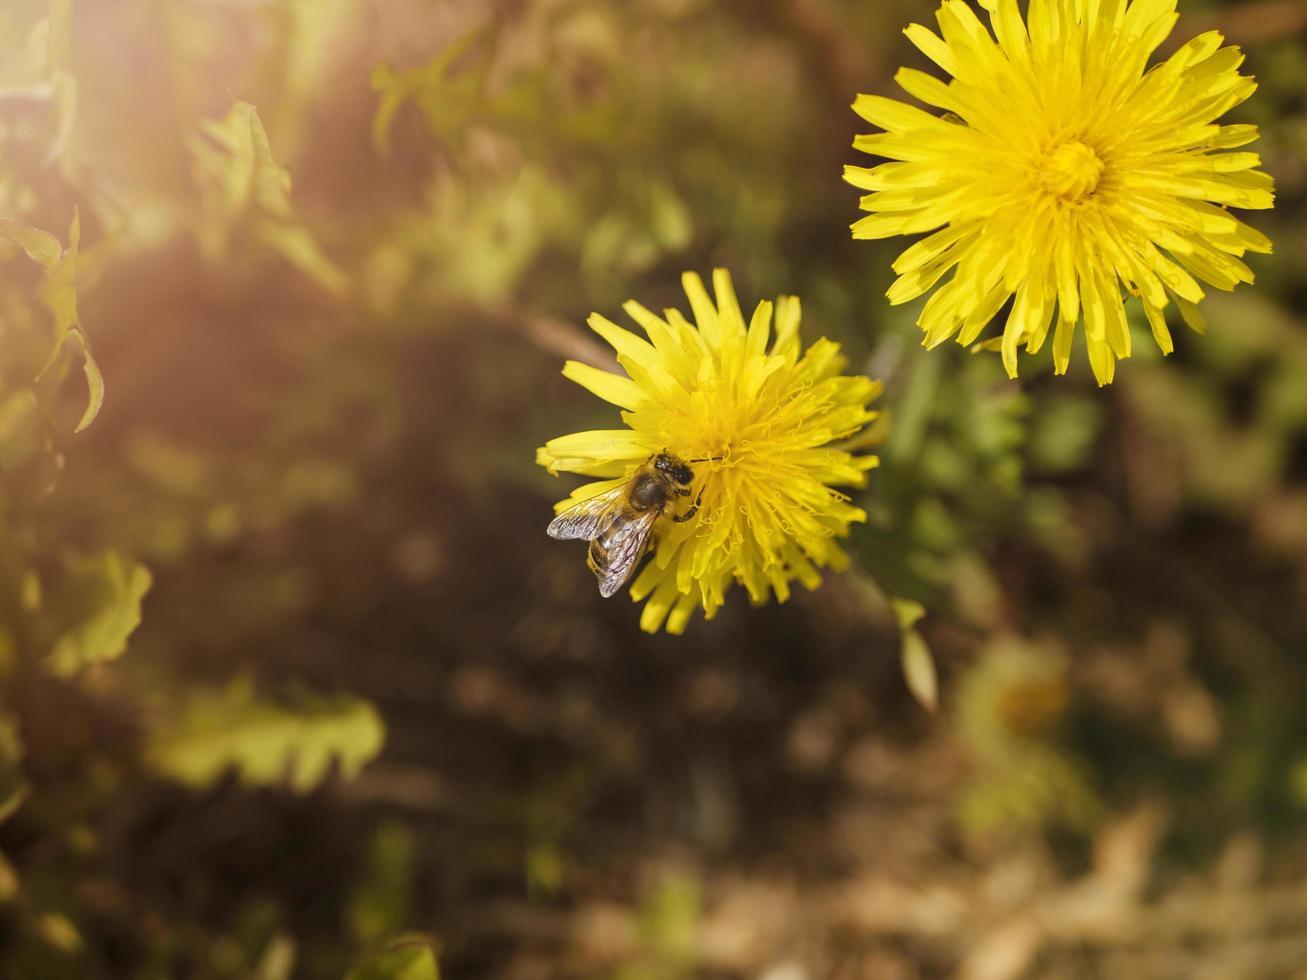 abeja en dientes de león foto